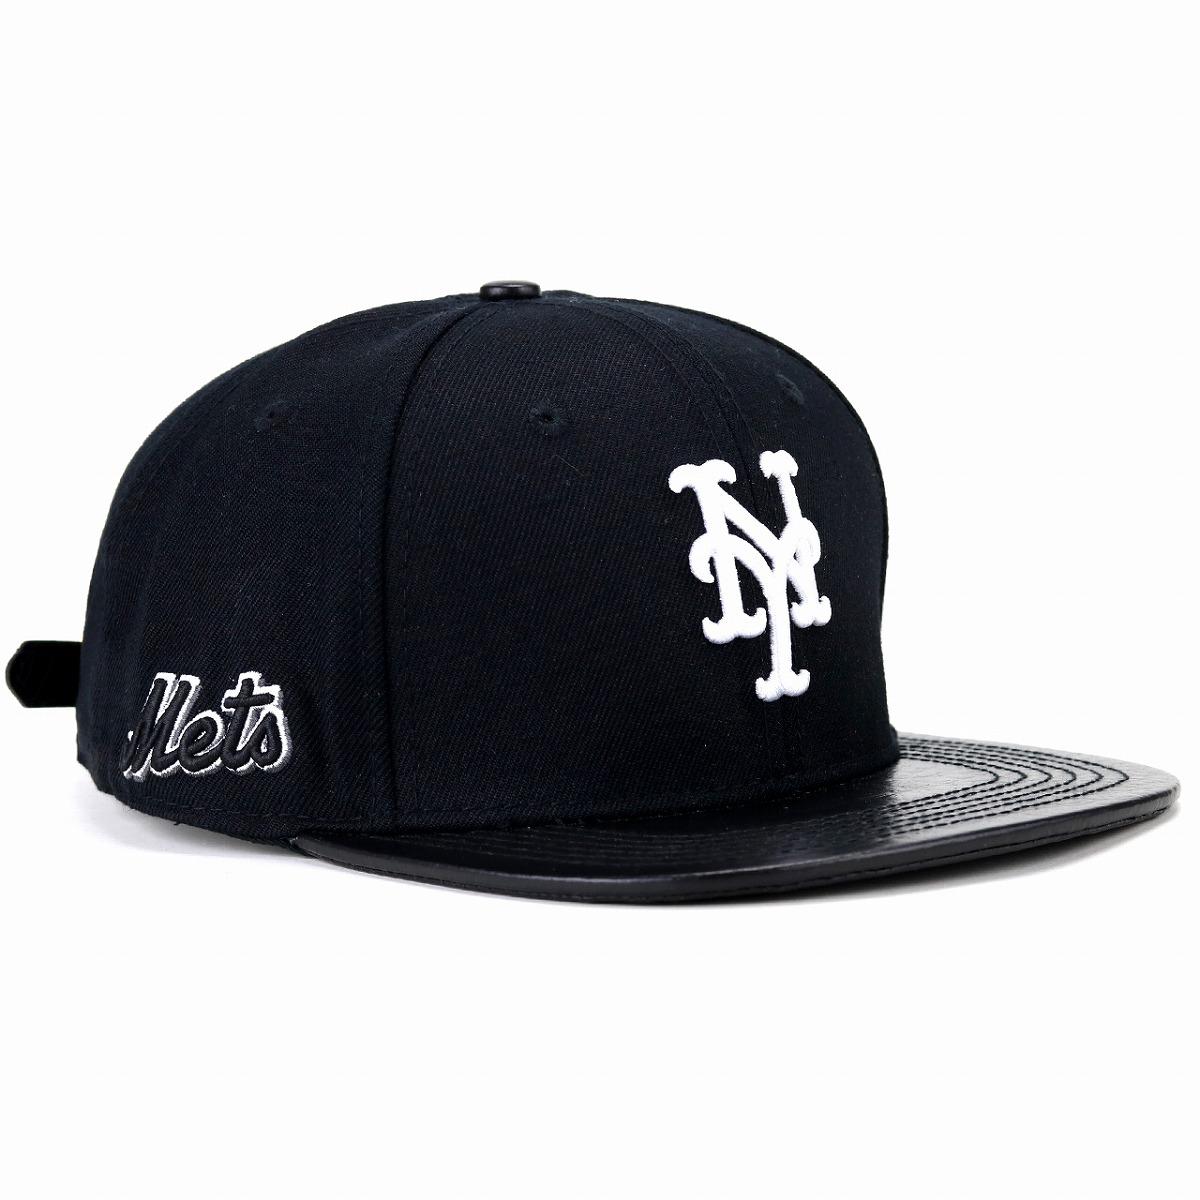 new product 0172f ee192 New York Mets logo cap professional standard MLB New York Mets Logo cap men  gap Dis hat Pro Standard baseball cap black black [baseball cap]